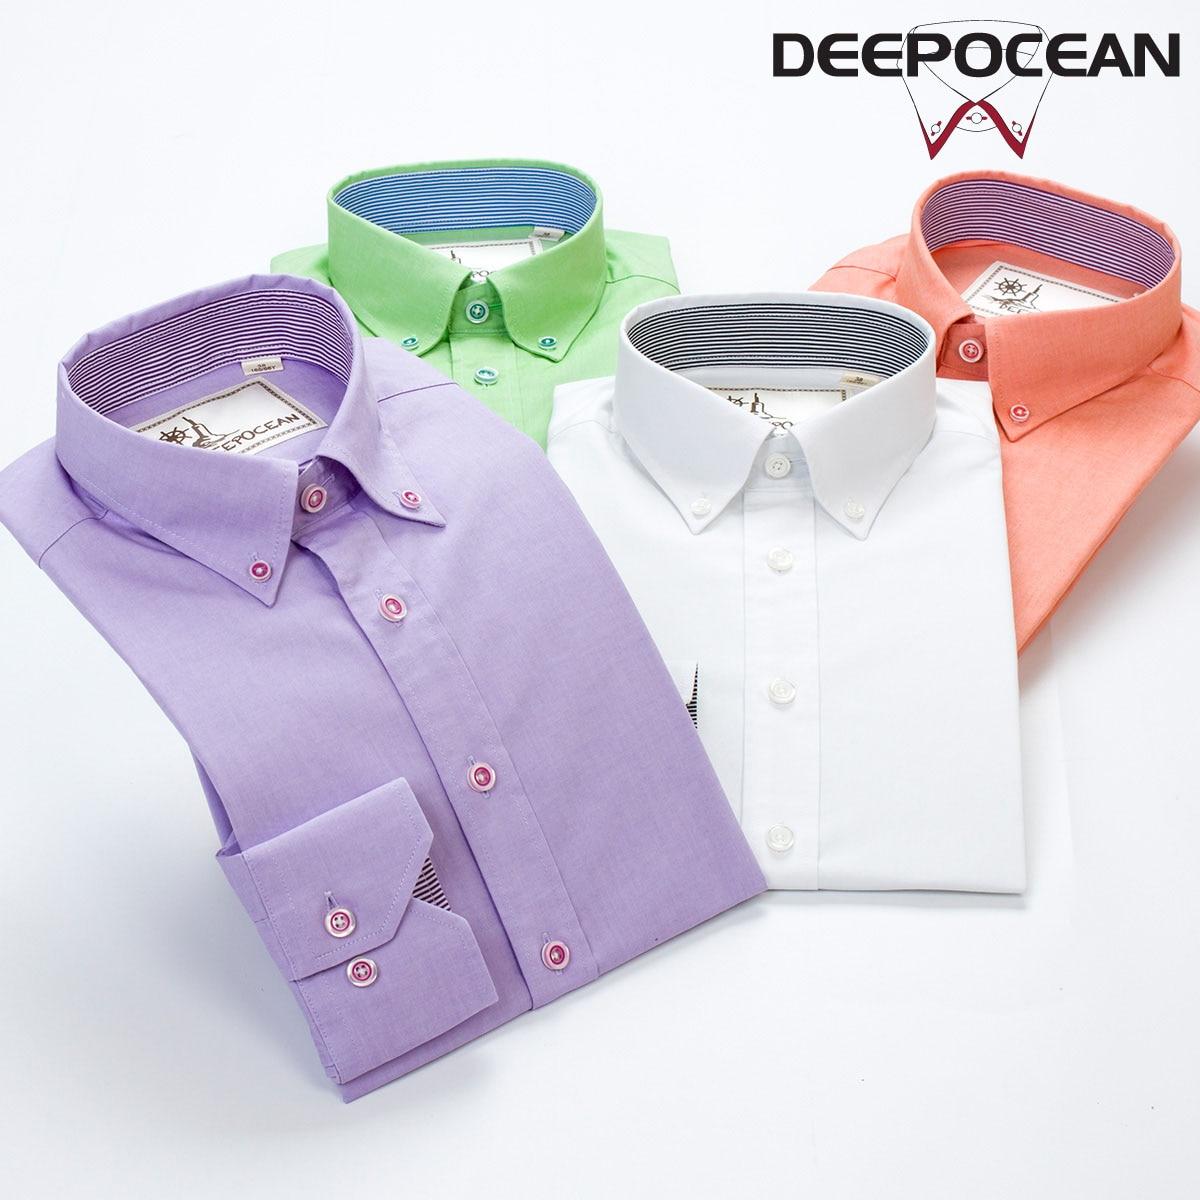 DEEPOCEAN 2016 Autumn new Men casual long sleeve shirt 100 cotton Solid color font b men